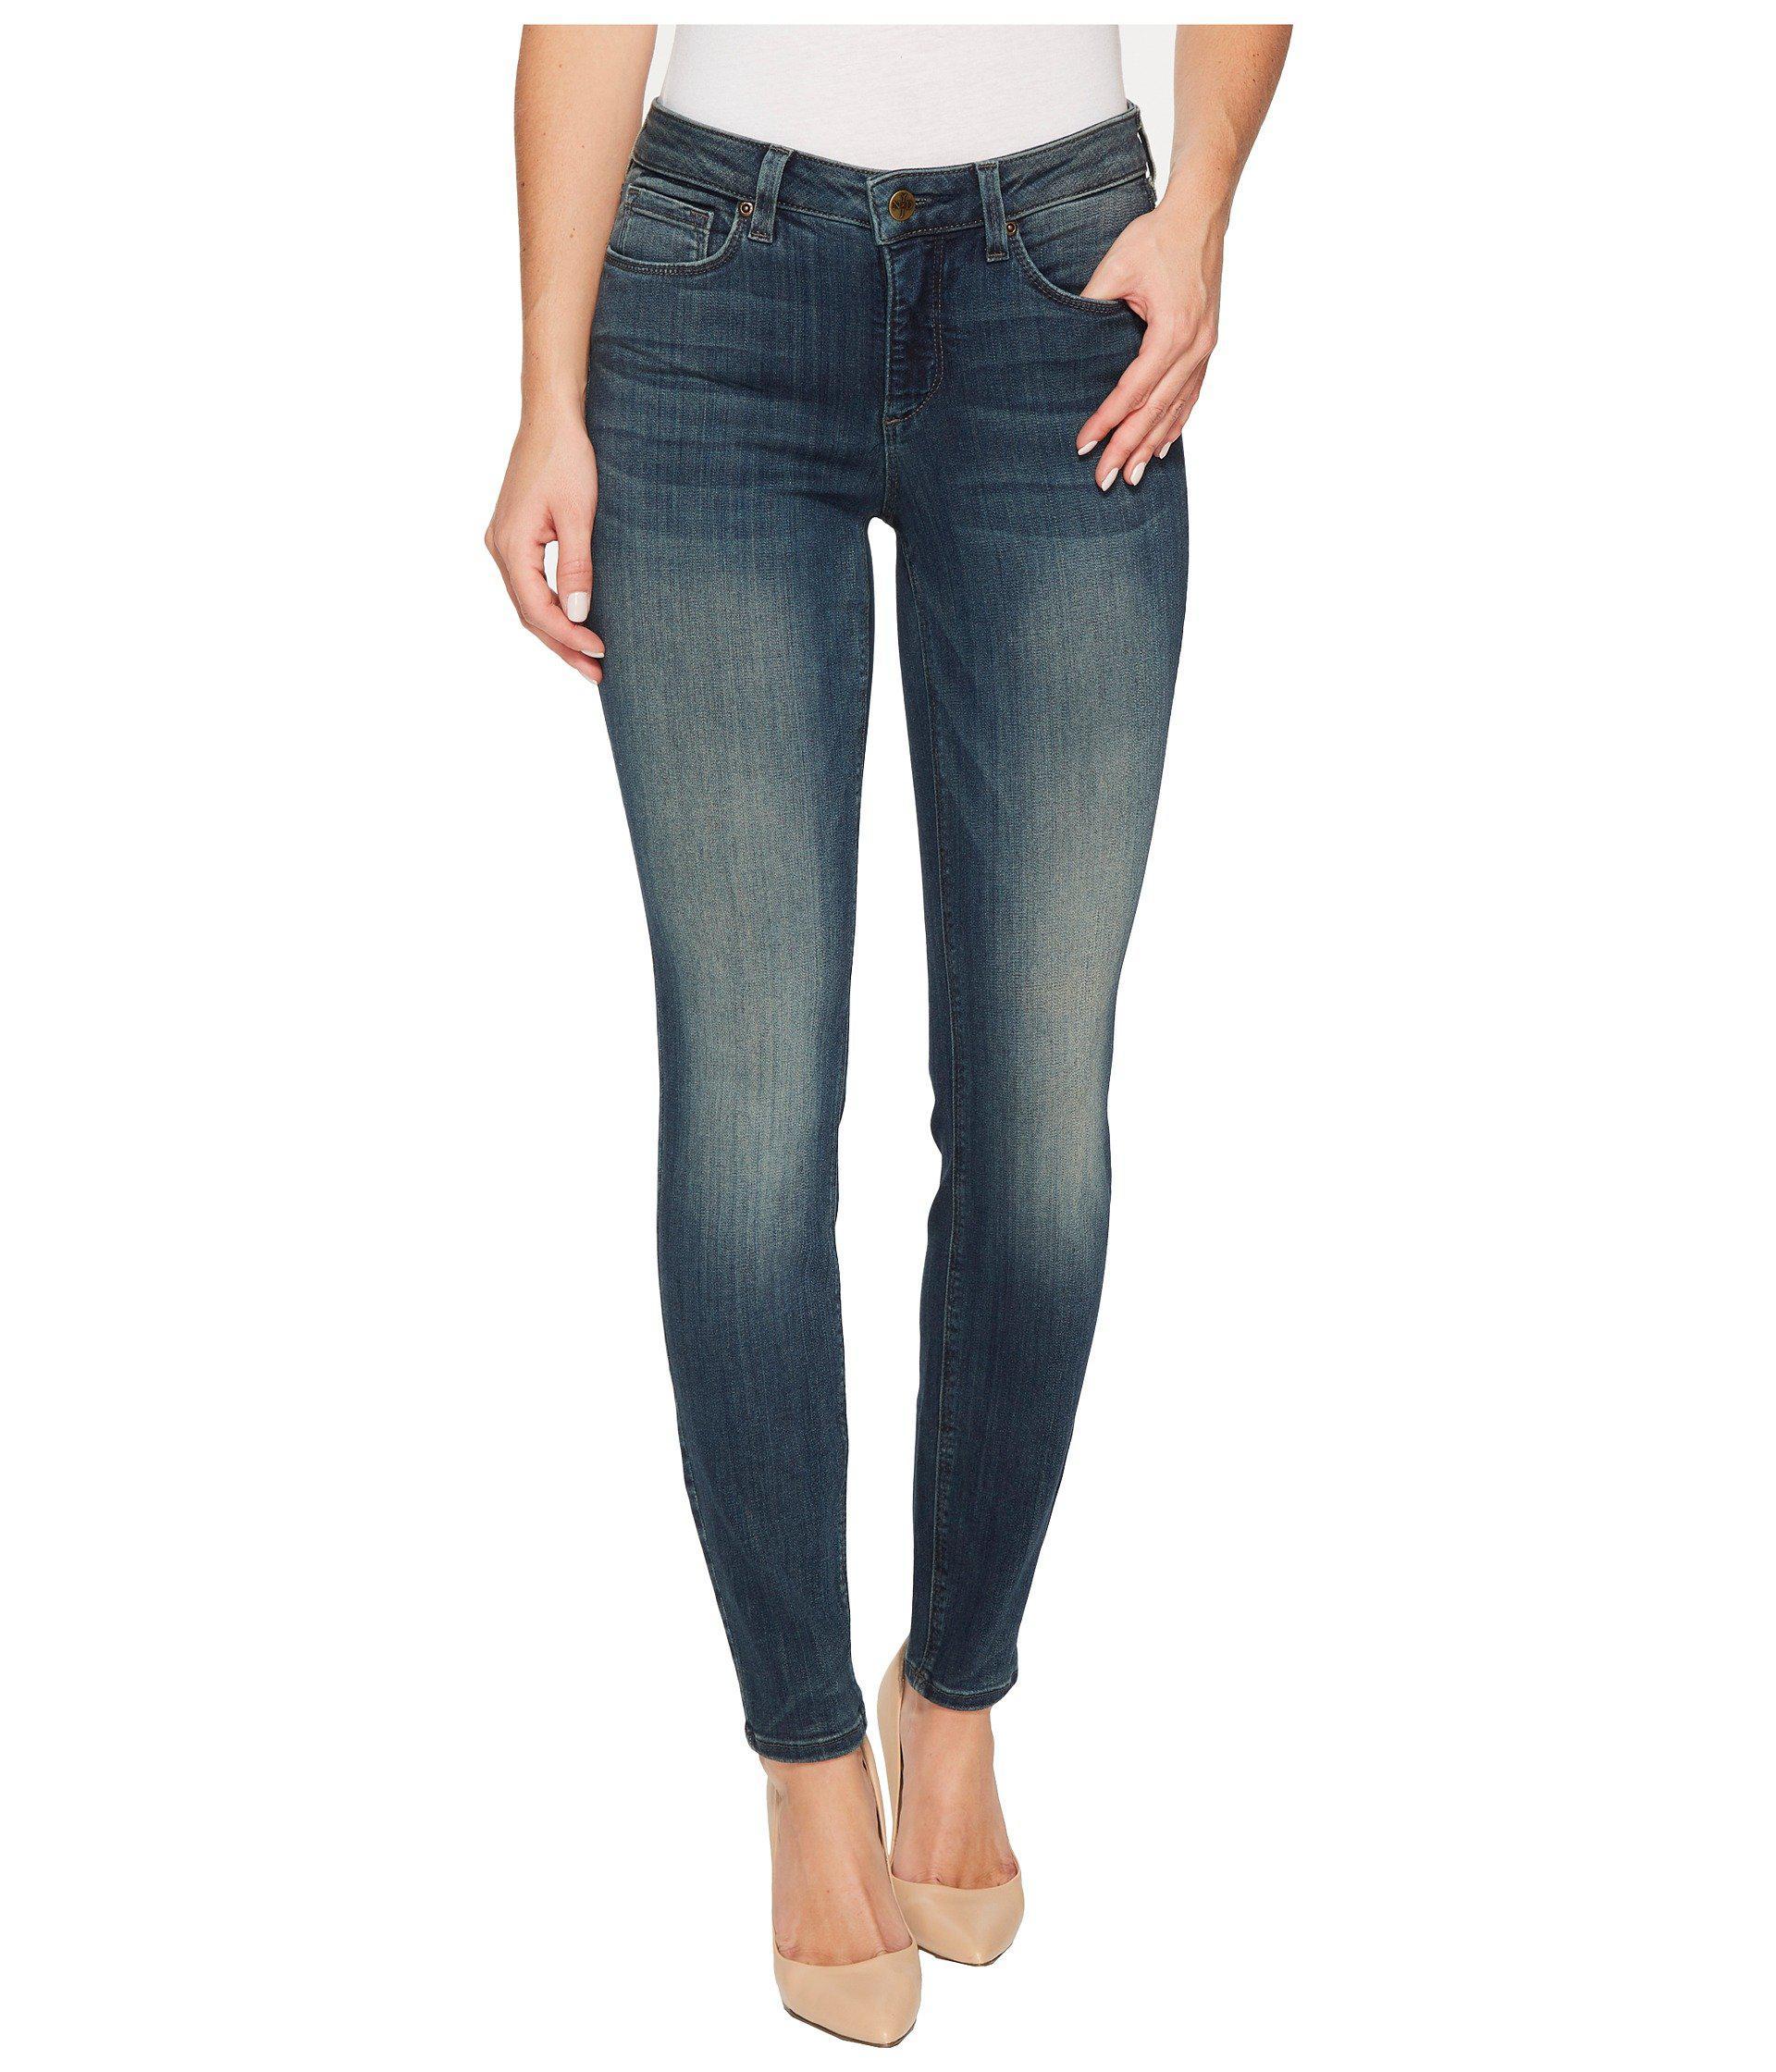 61969458888 Lyst - NYDJ Dylan Skinny Ankle Jeans In Sure Stretch Denim In Axiom ...